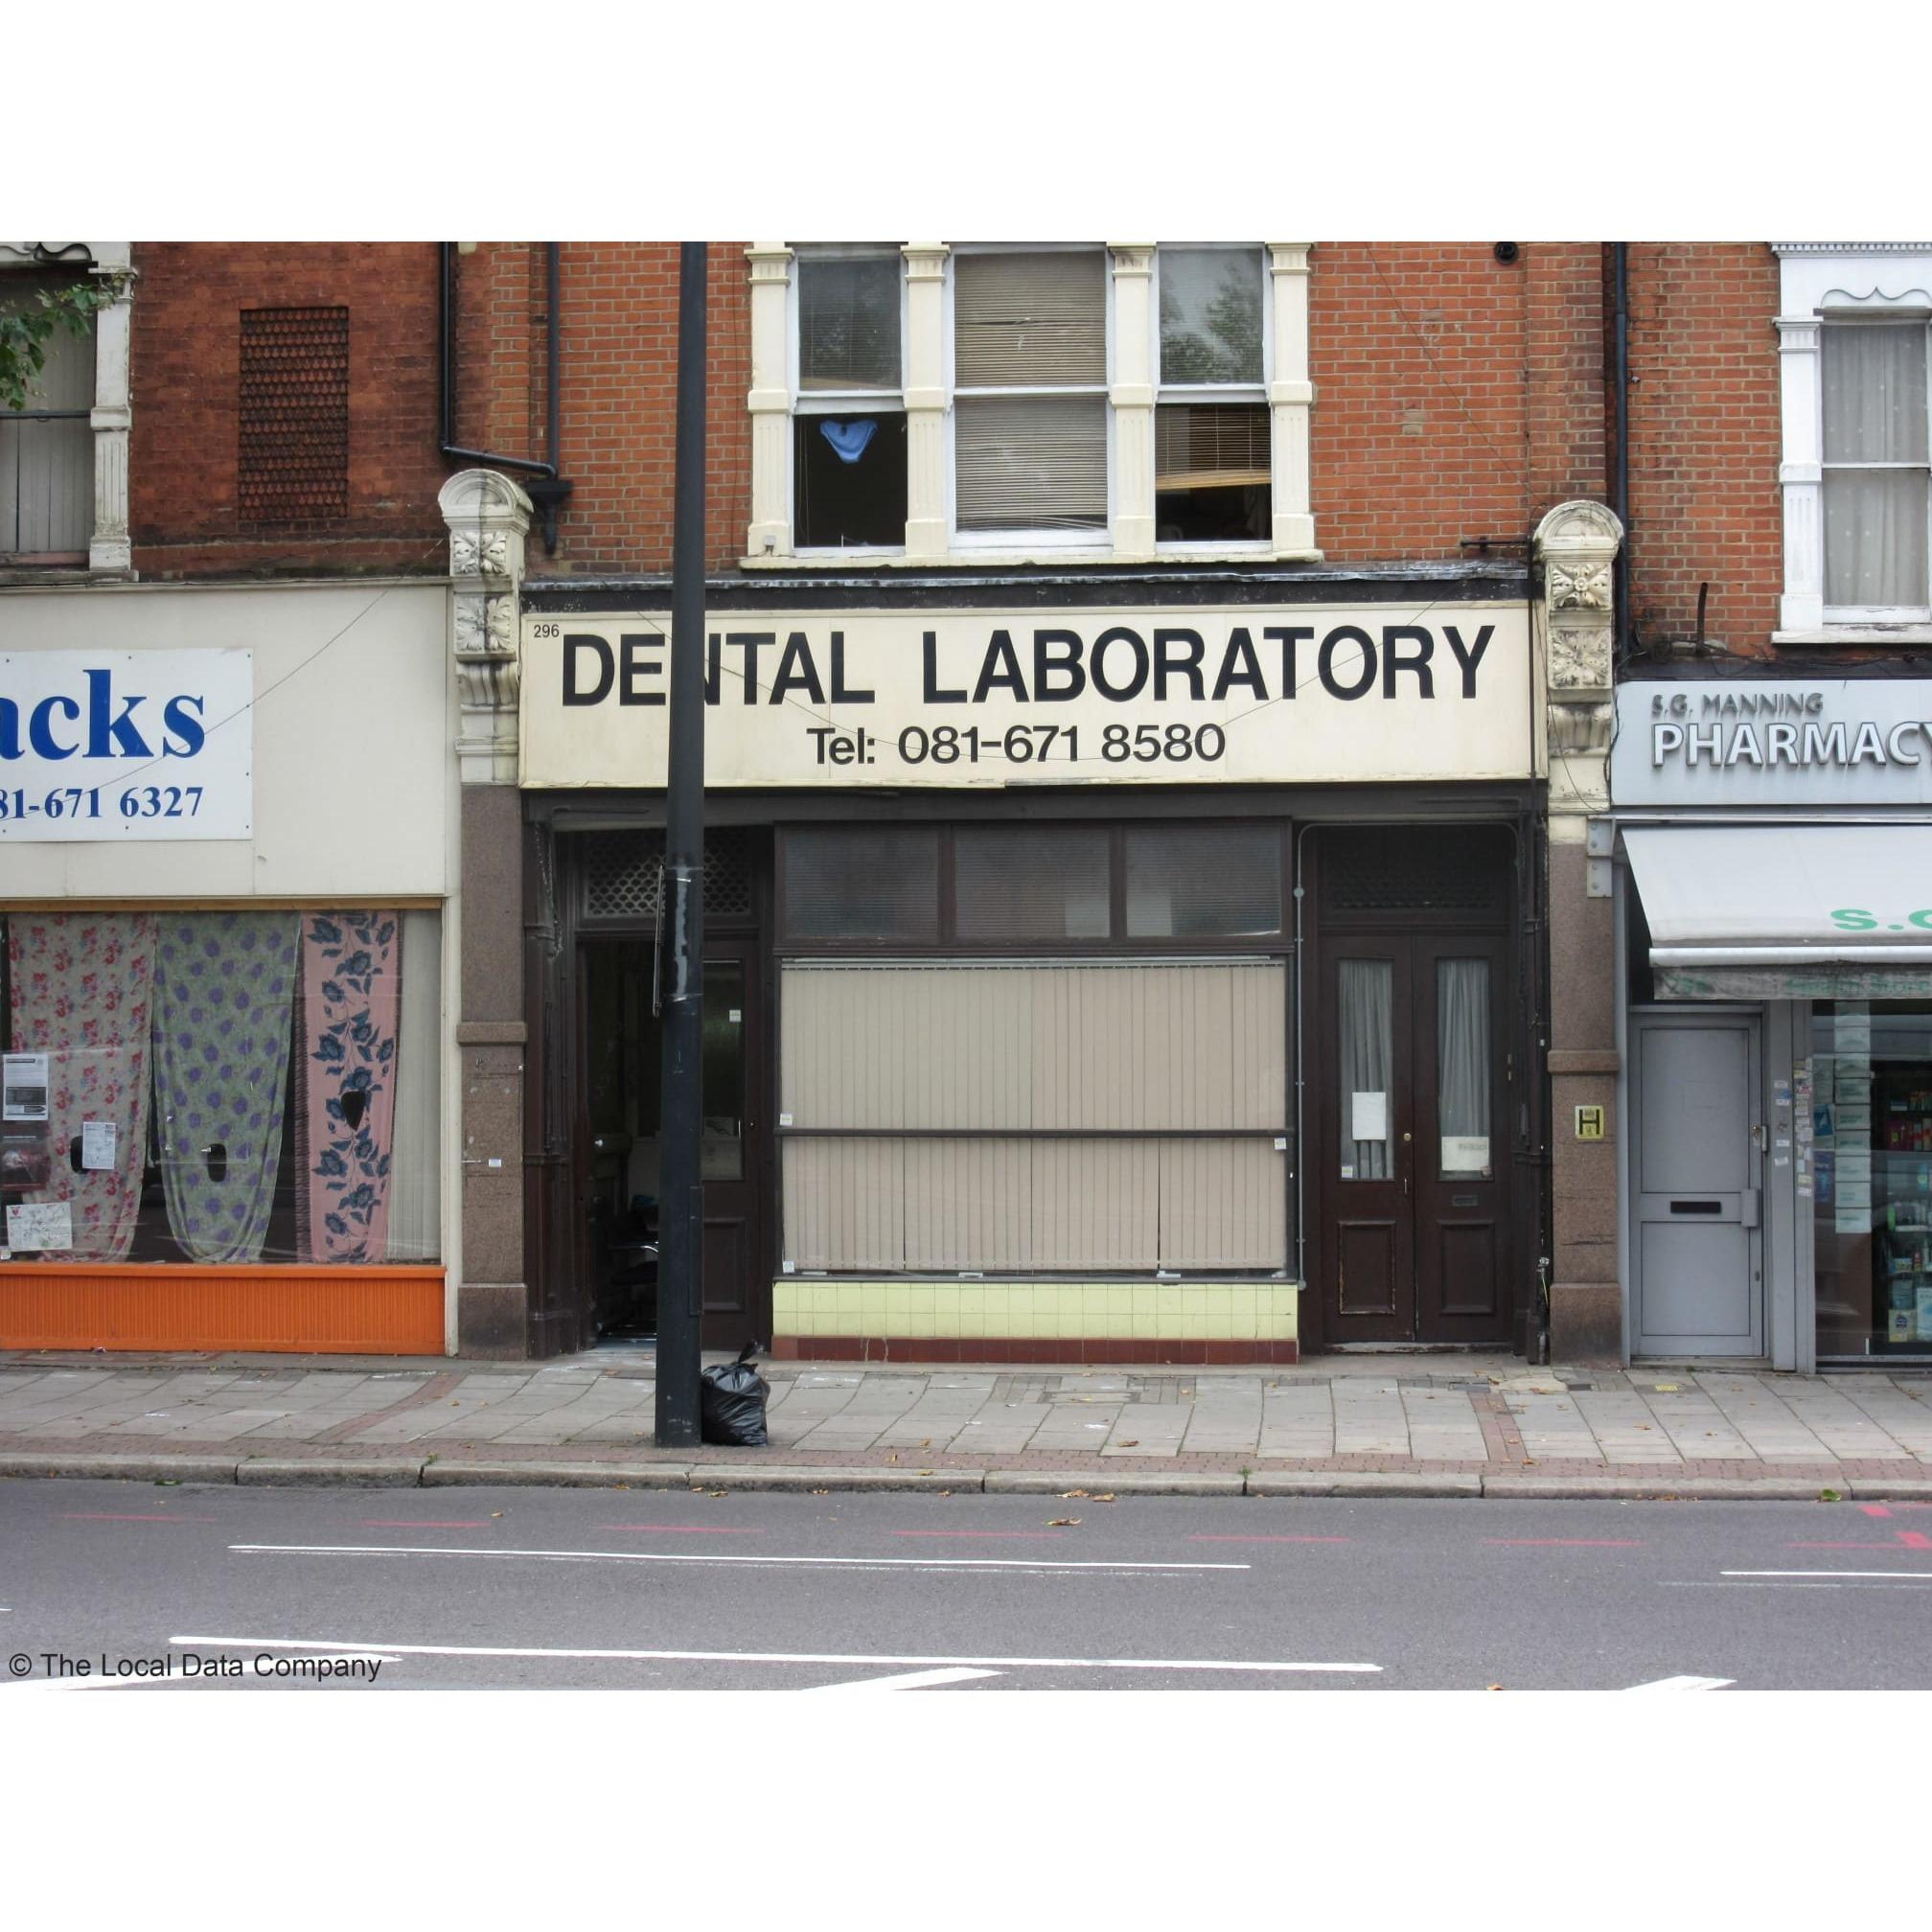 G Szekely Dental Laboratory - London, London SW2 1HT - 020 8671 8580 | ShowMeLocal.com